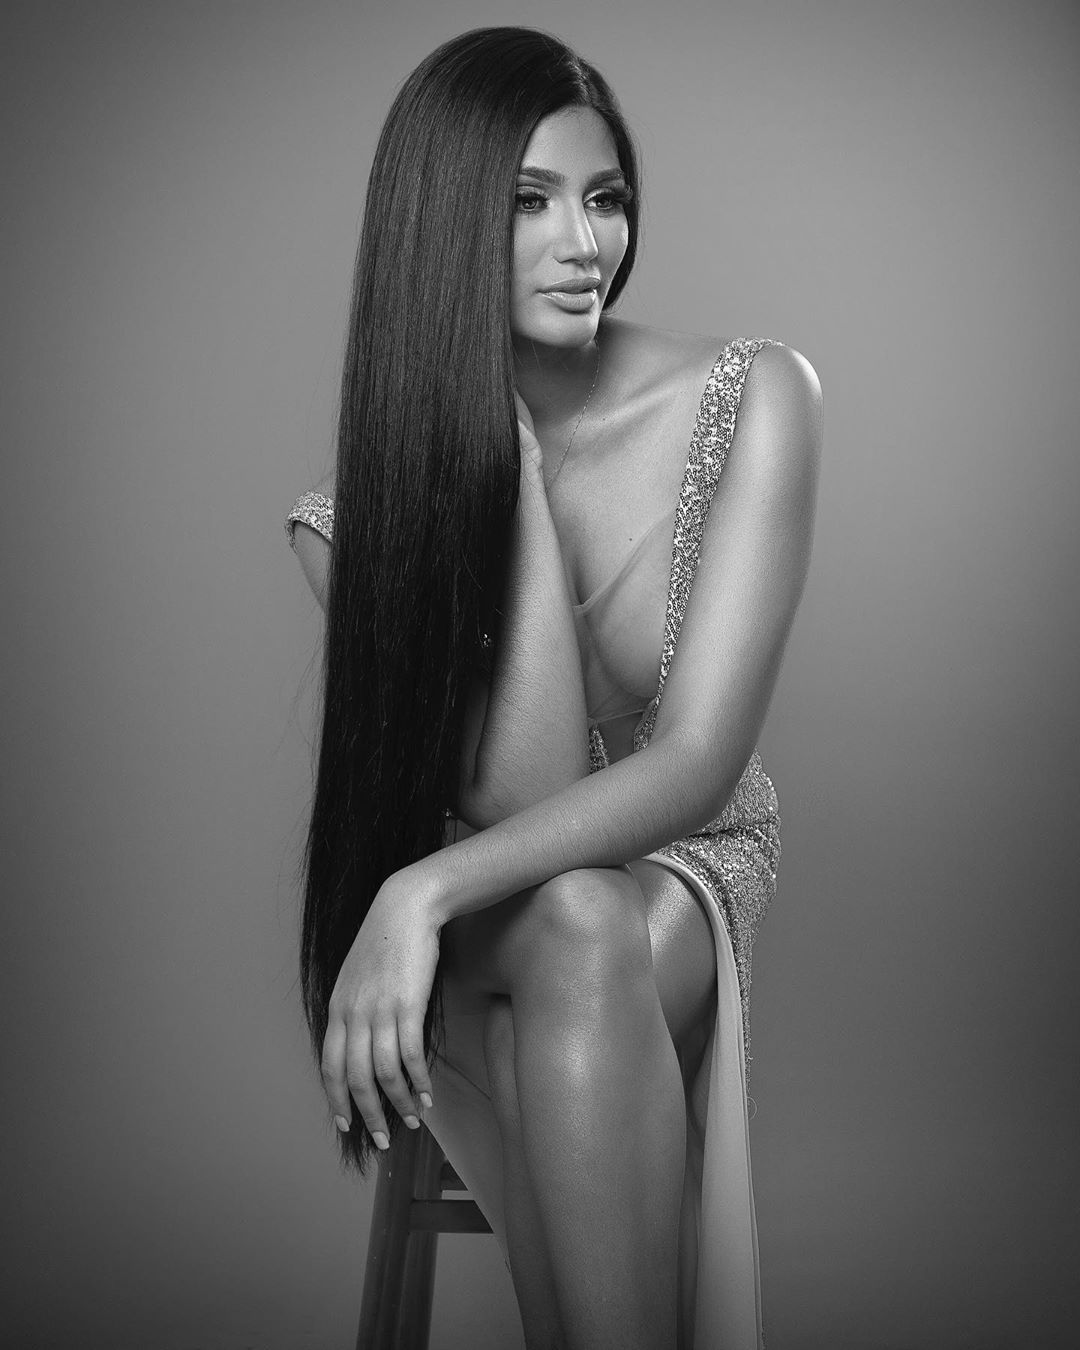 La Miss Venezuela Sthefany Gutiérrez da mercados en crisis del COVID-19 Ik9pMC